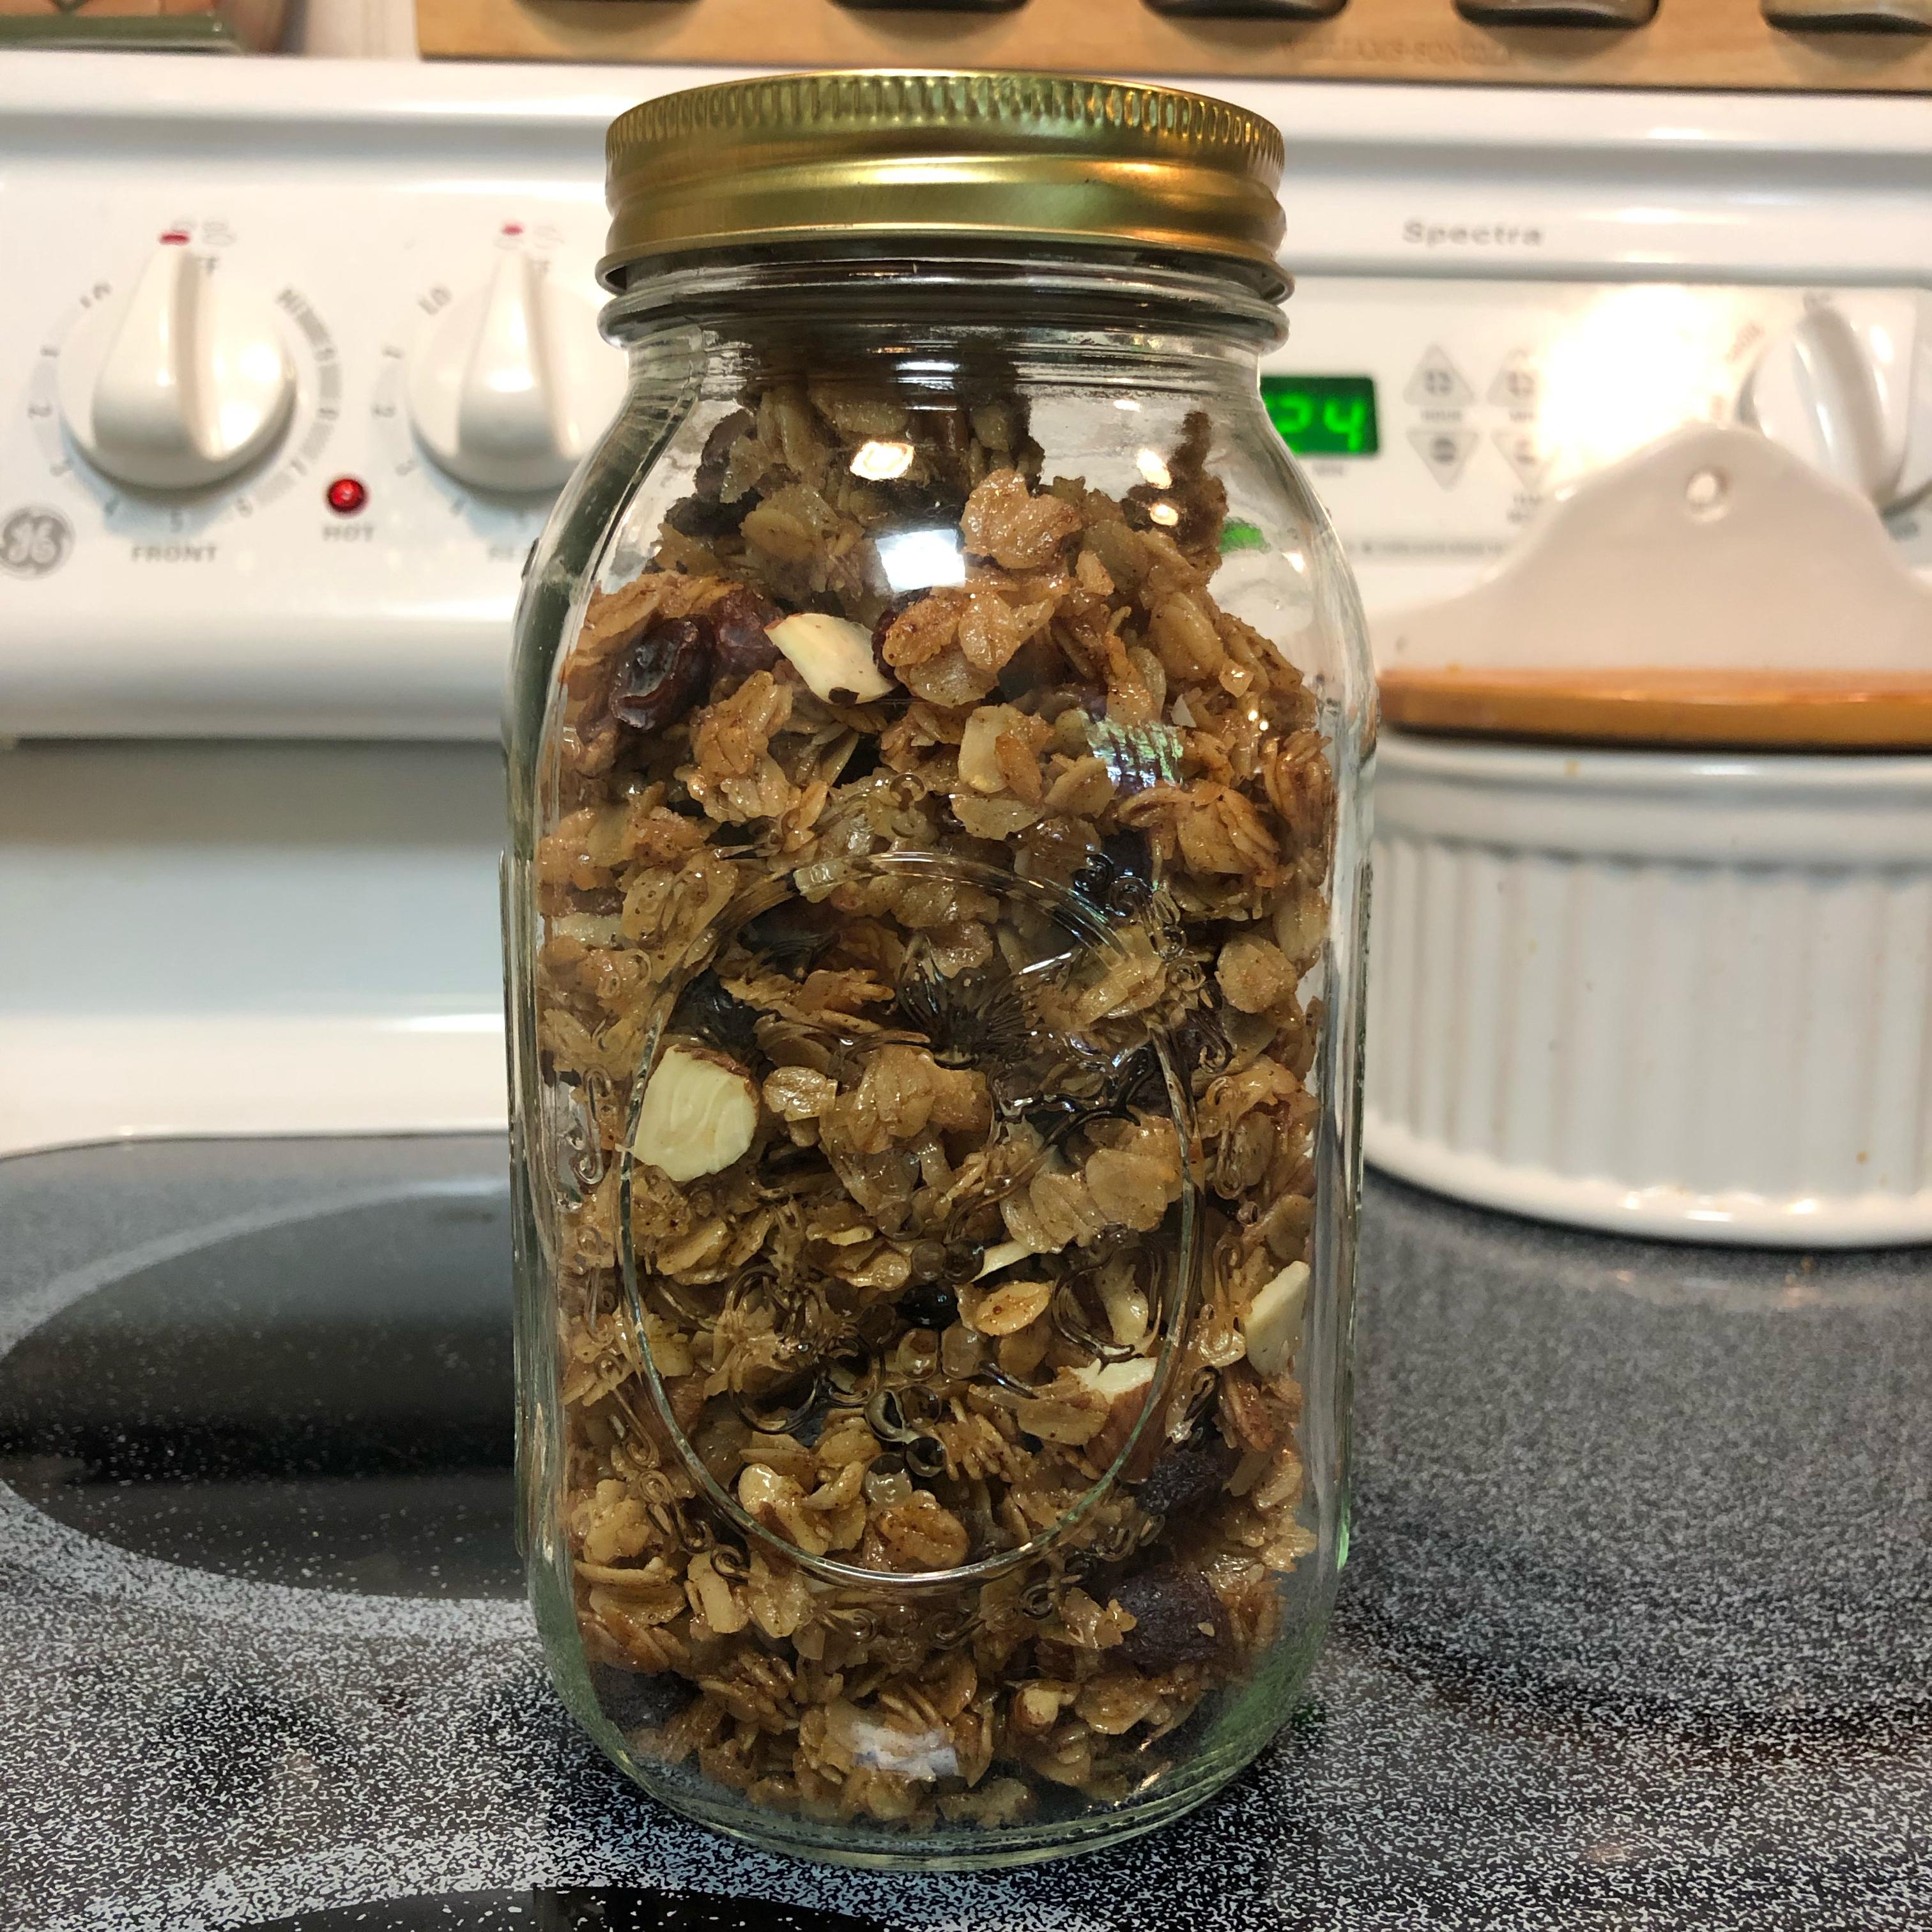 Grandma's Homemade Granola julie